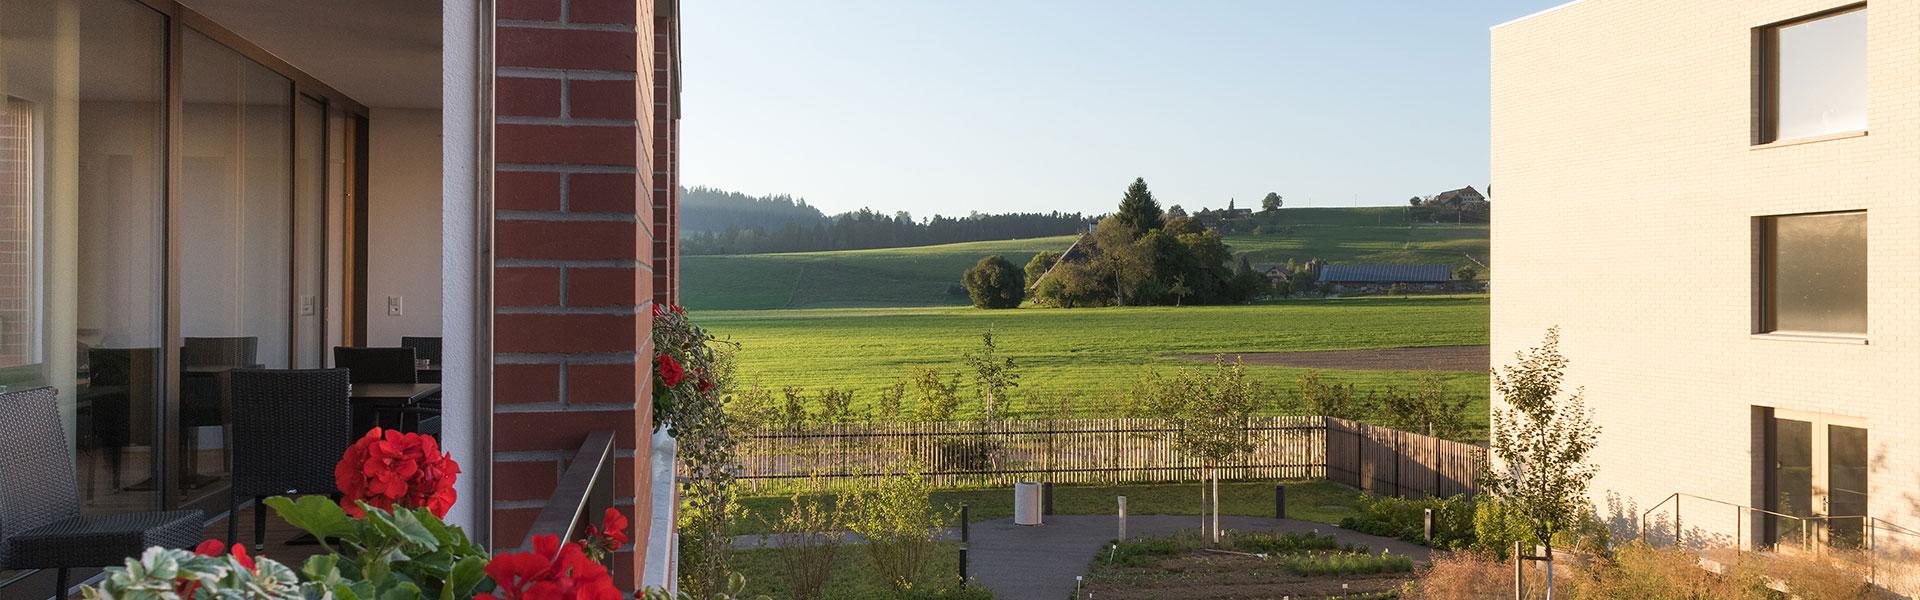 Feedbacks sumia - Alterszentrum Sumiswald AG